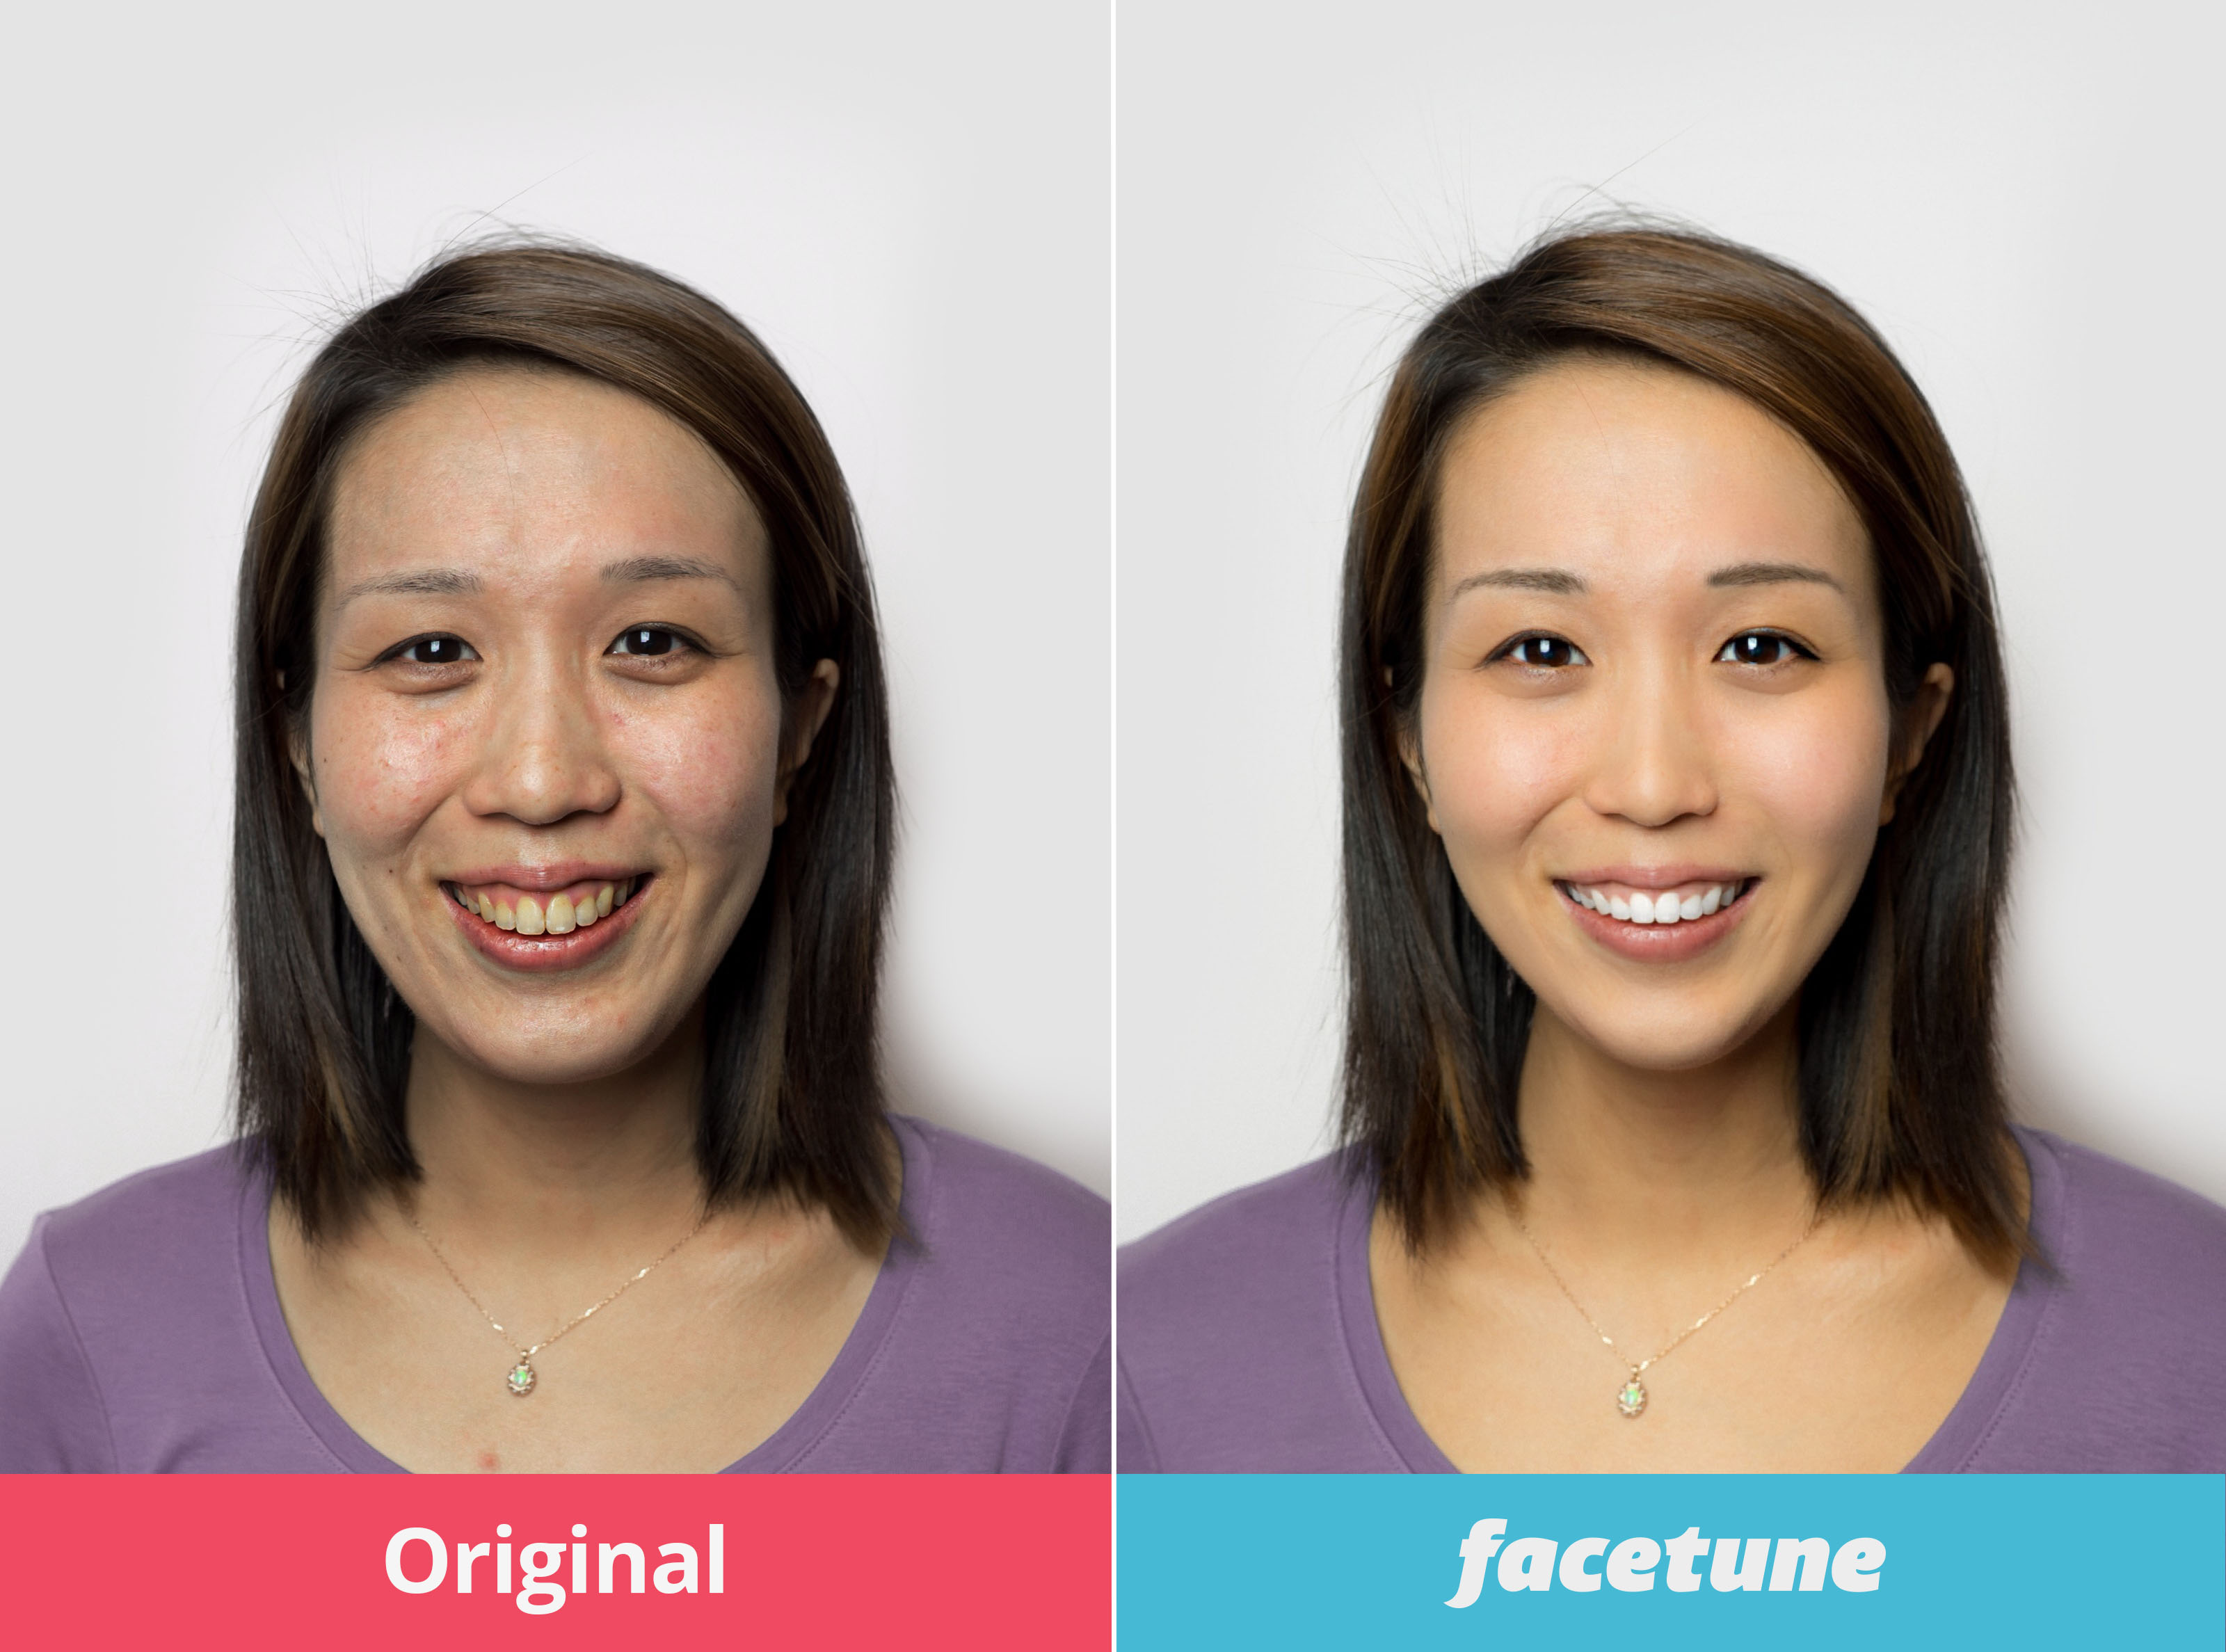 facetune photoshop selfie